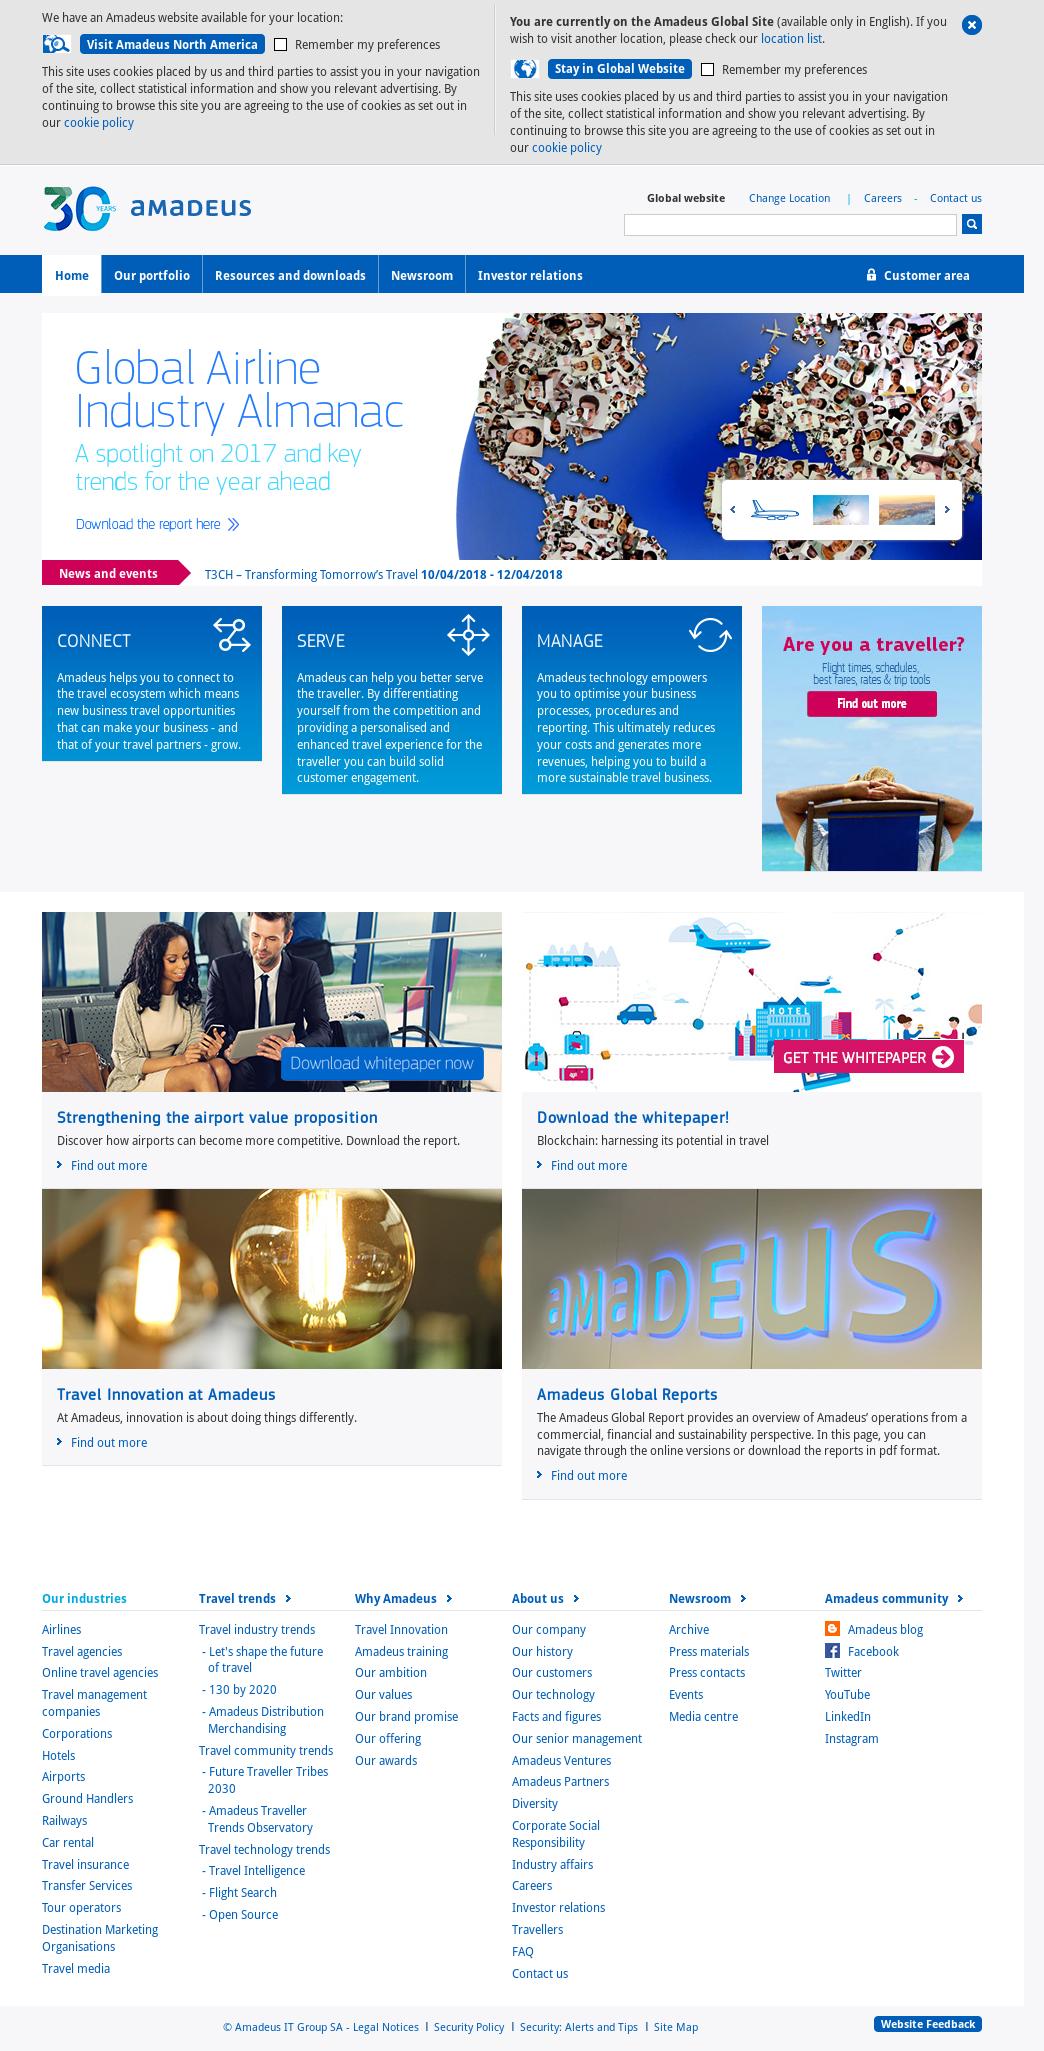 Amadeus Competitors, Revenue and Employees - Owler Company